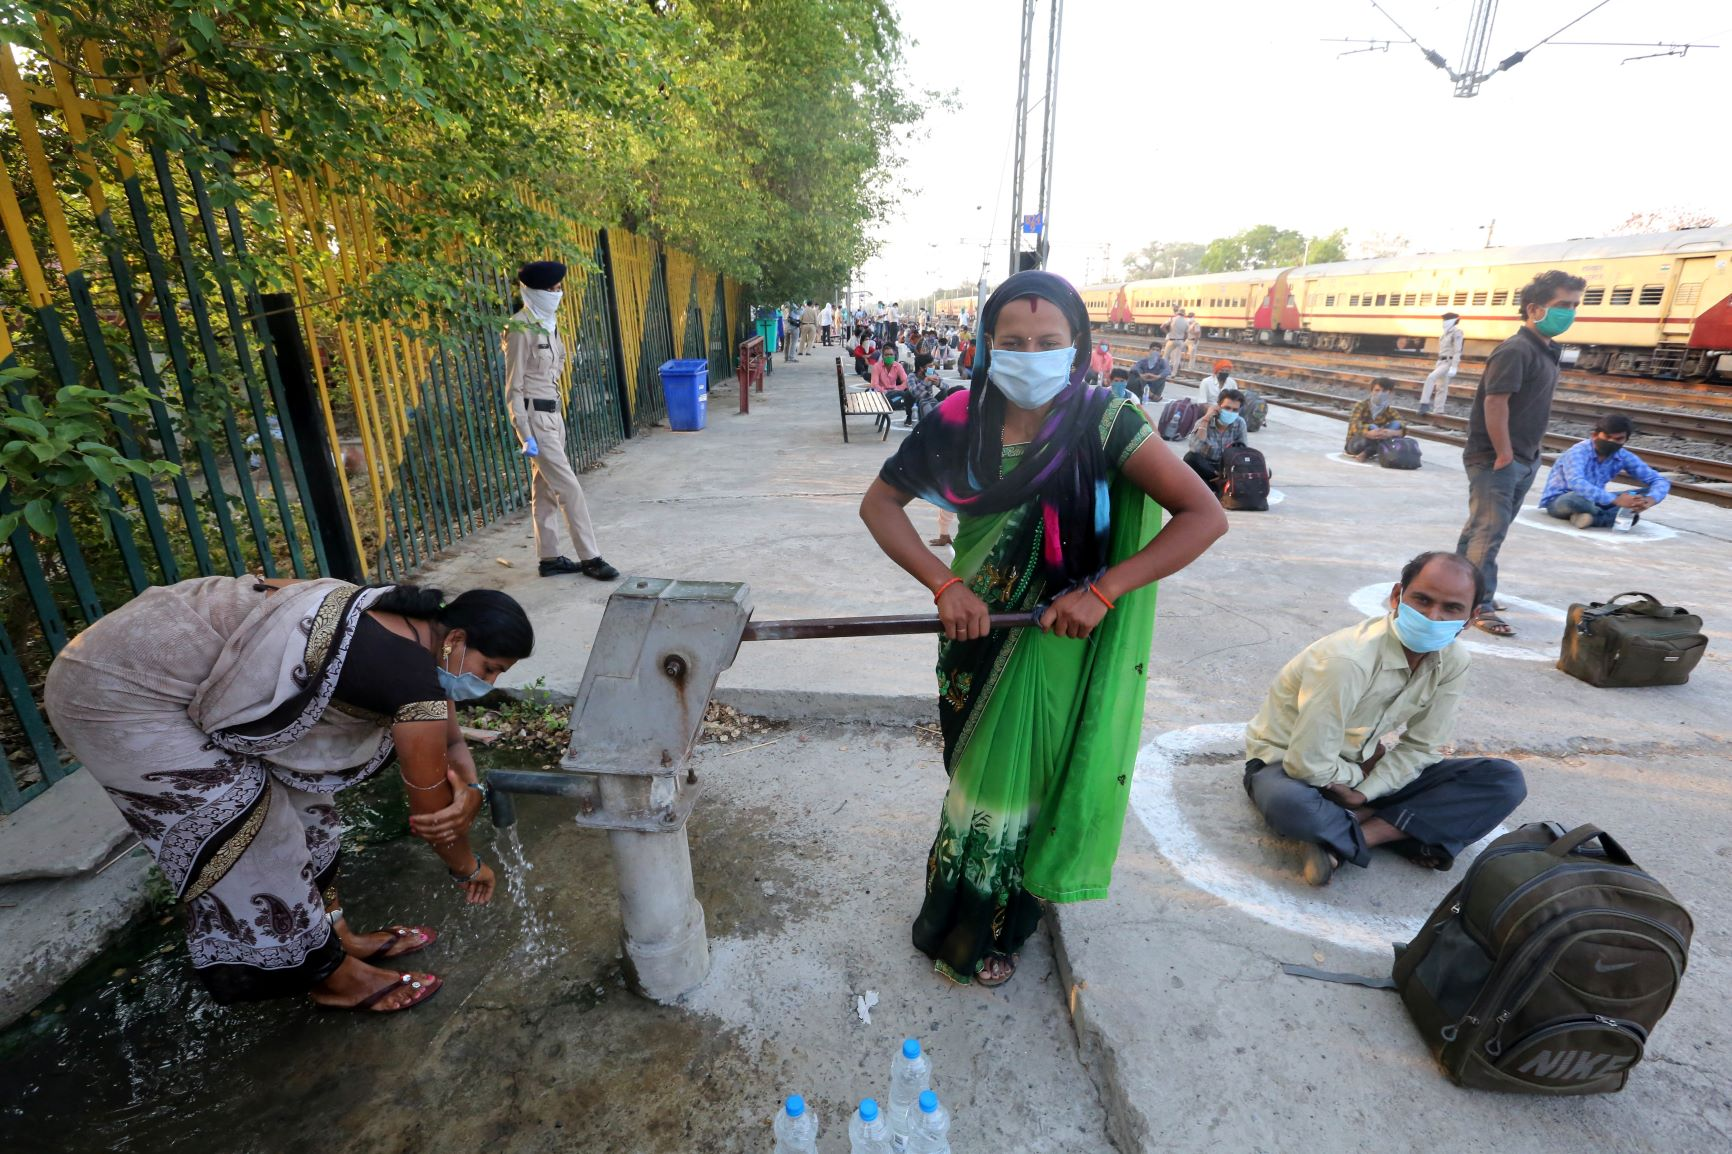 cities,women,urban spaces